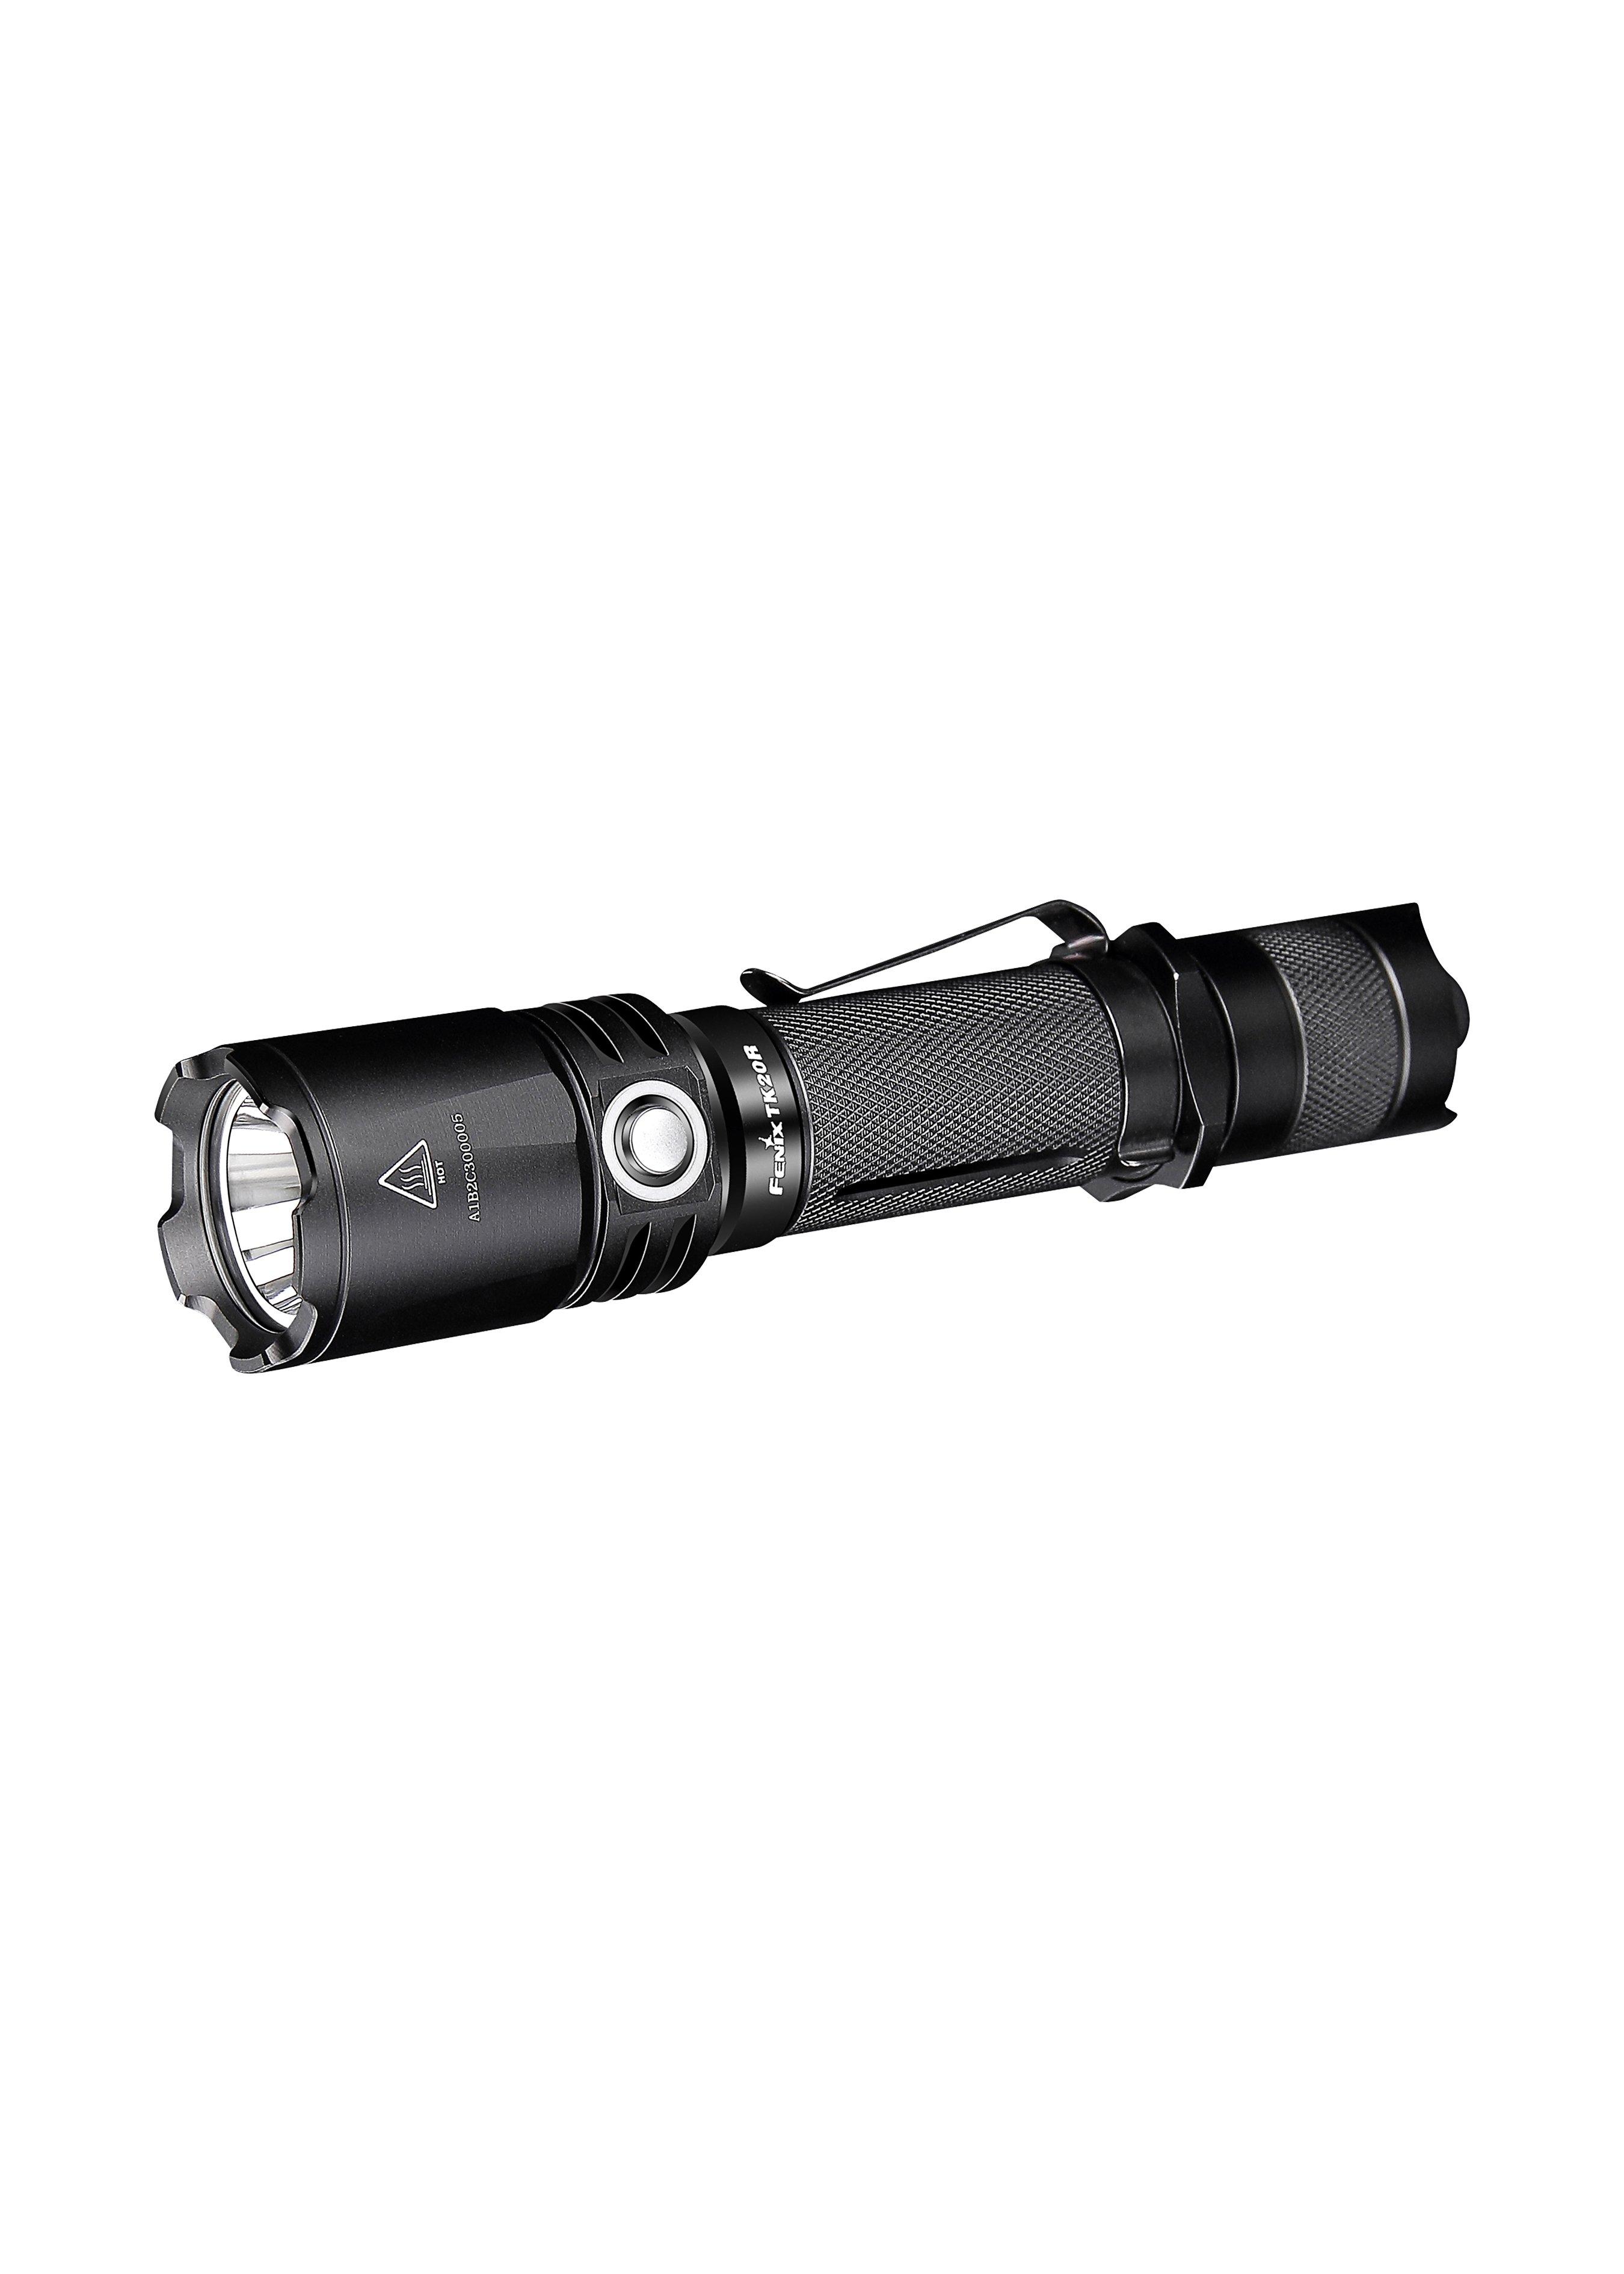 Fenix Profi LED-Taschenlampe TK20R 186410 1